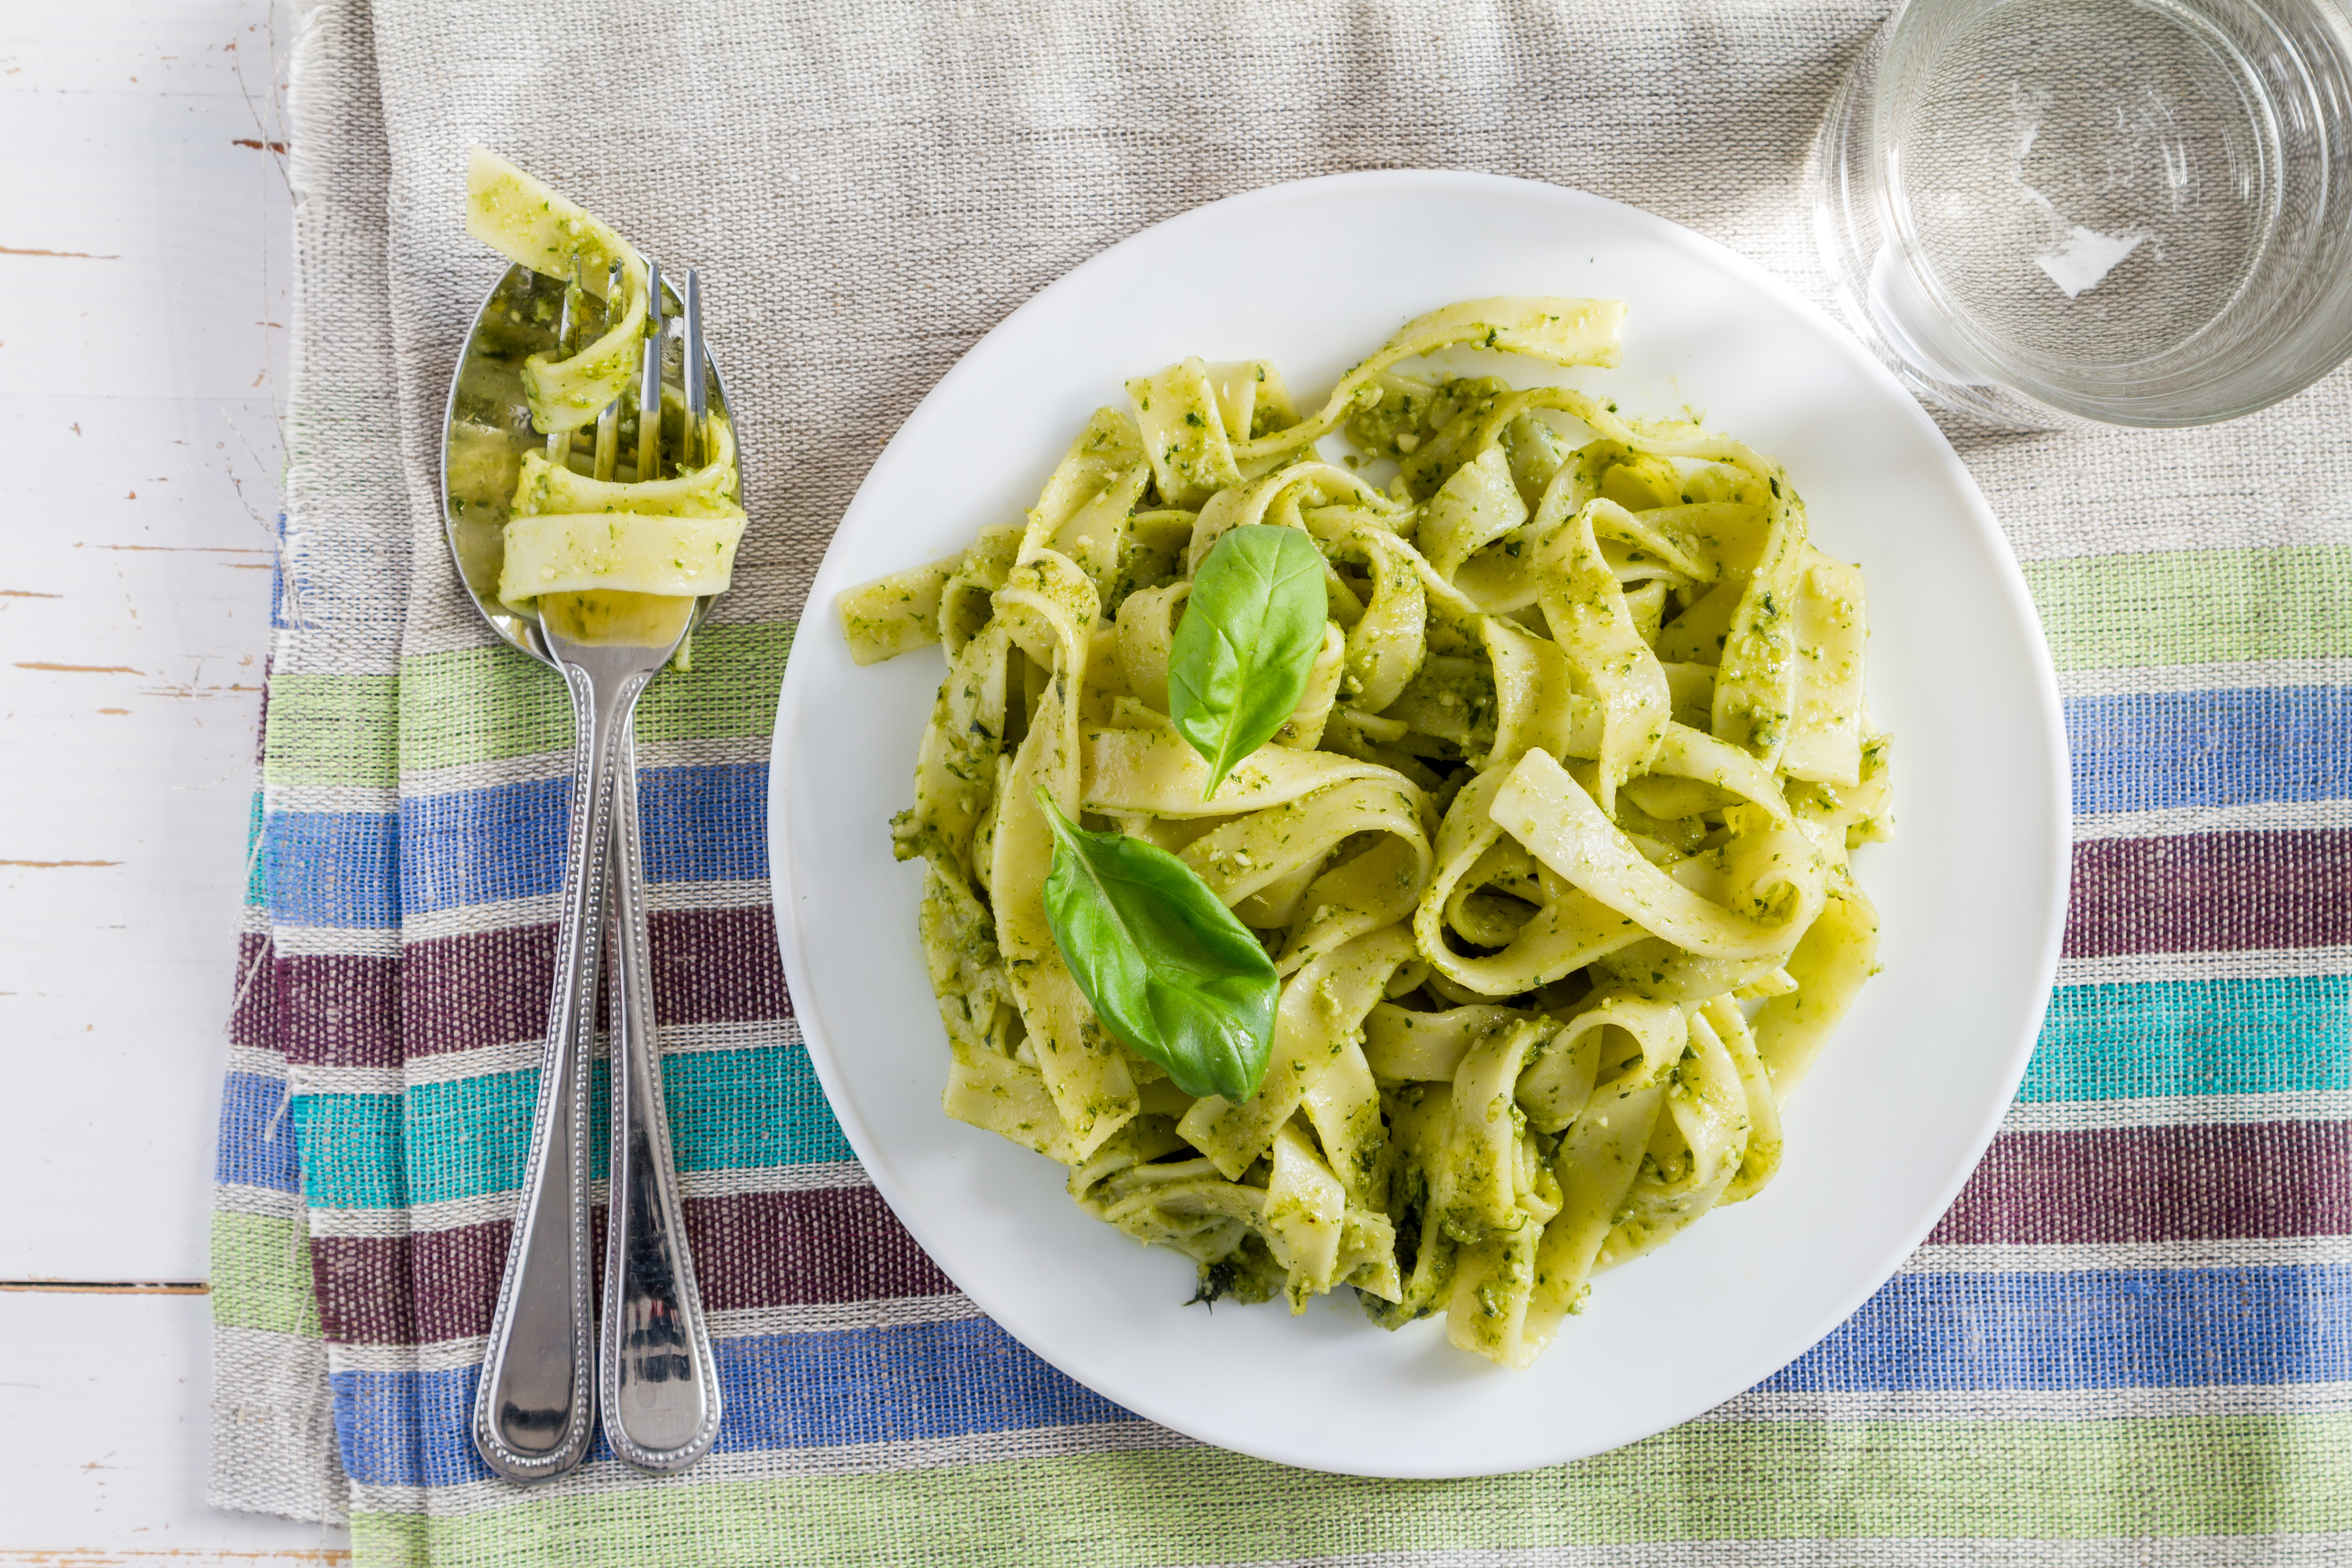 Italian food background photo